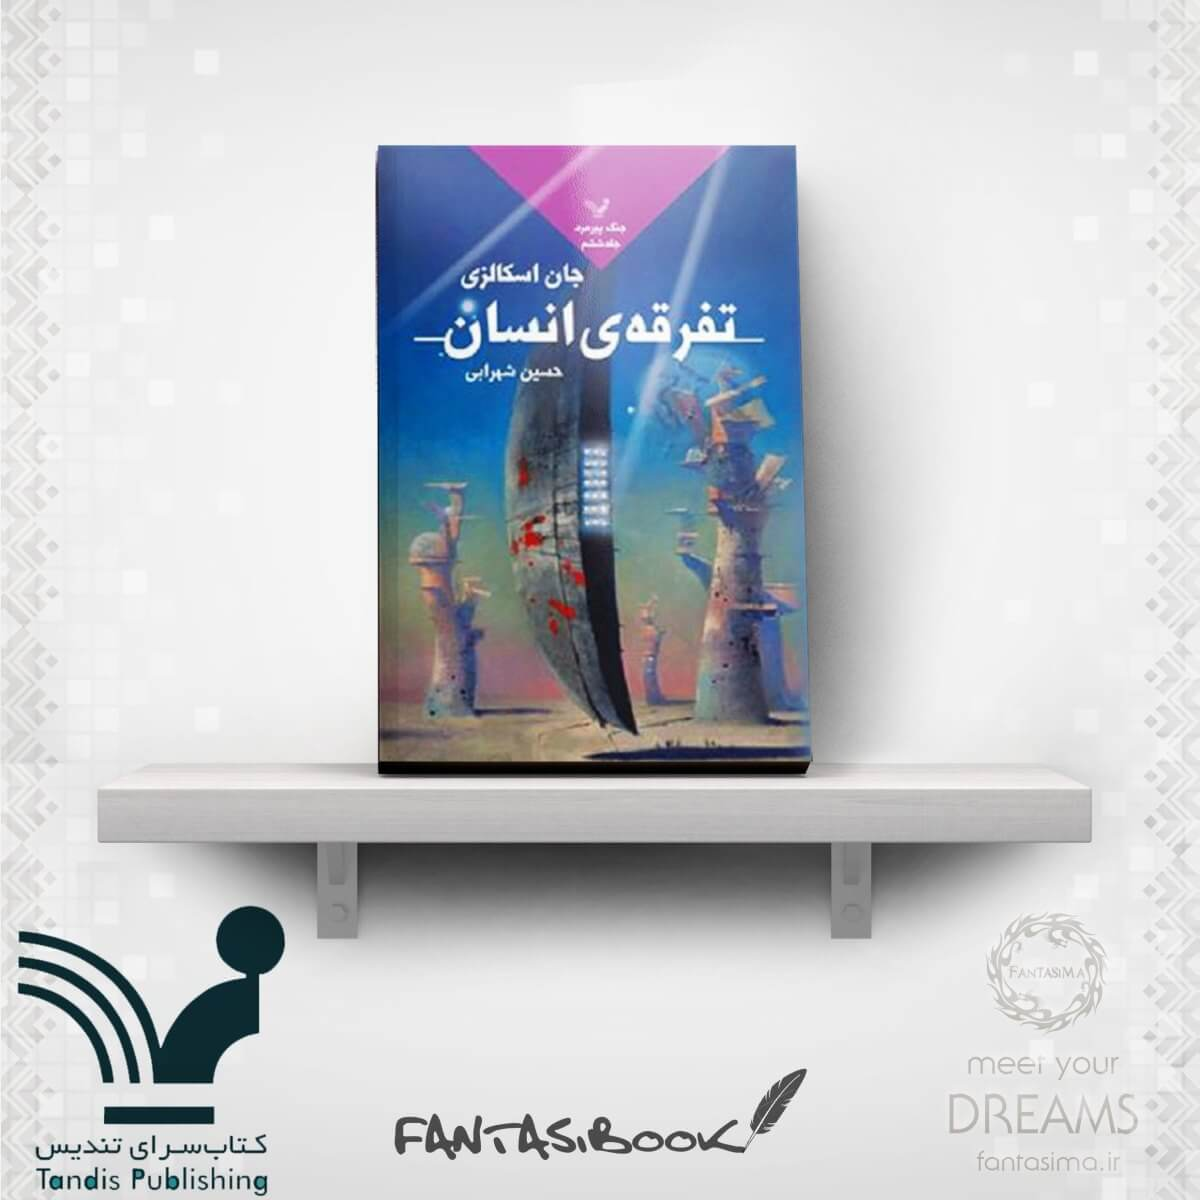 کتاب جنگ پیرمرد - جلد 6 - تفرقهی انسان